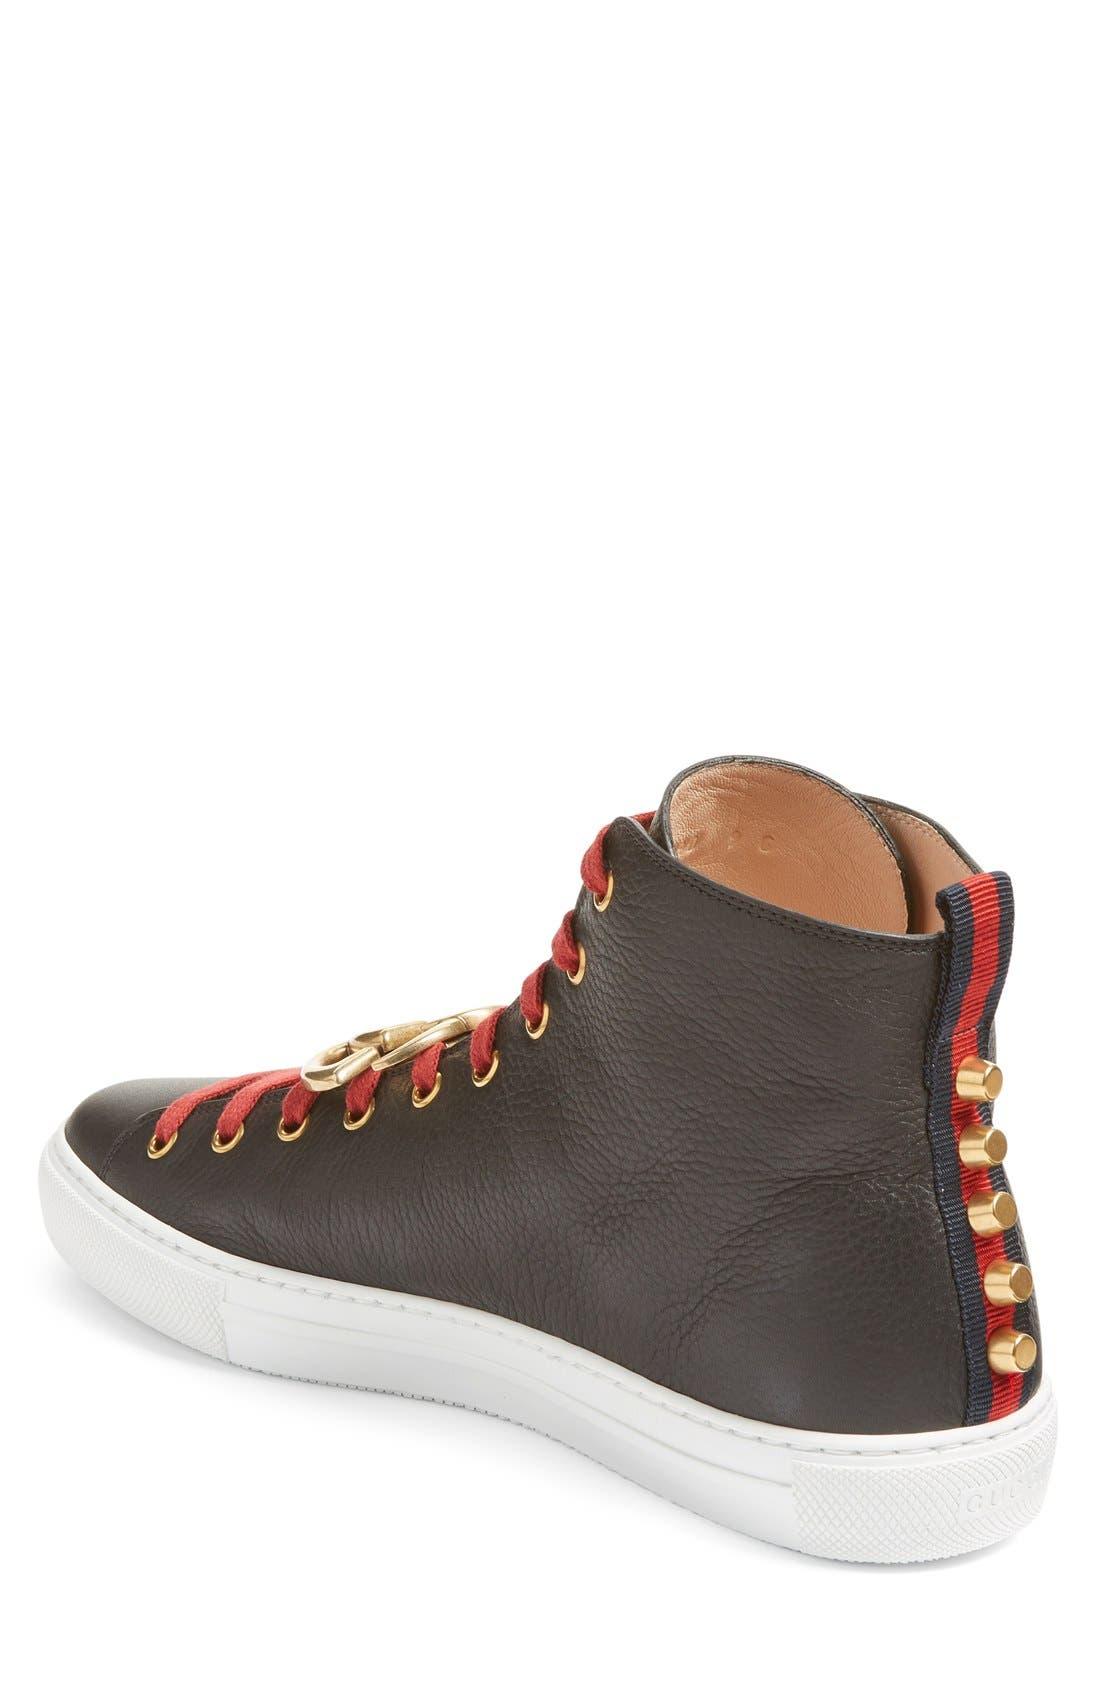 Alternate Image 2  - Gucci Major High Top Sneaker (Men)